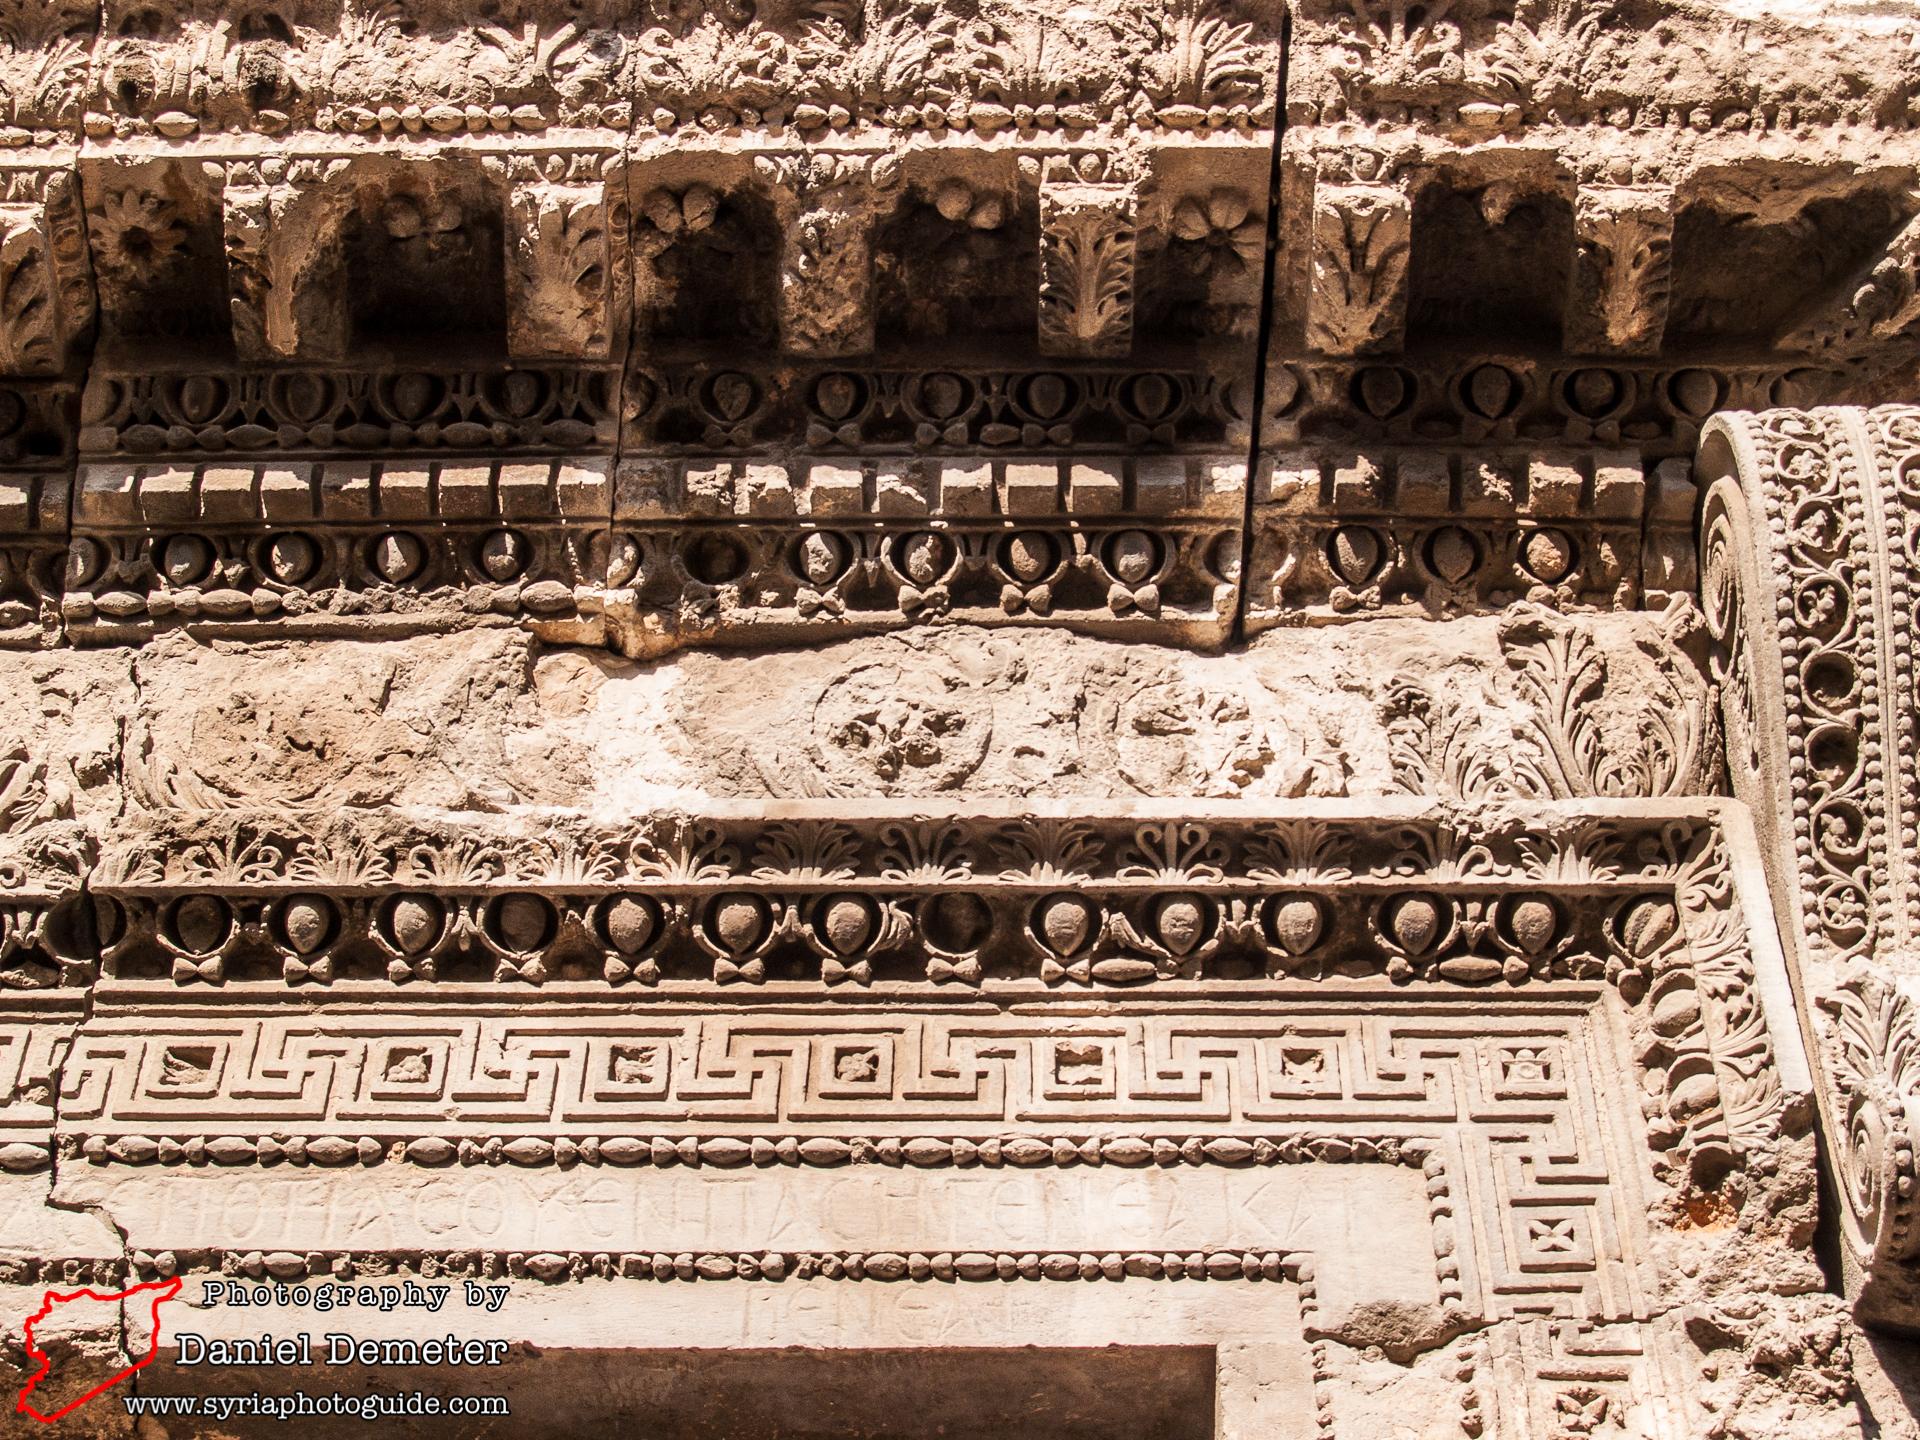 Damascus – Roman Ruins دمشق – الآثار الرومانية | Syria Photo